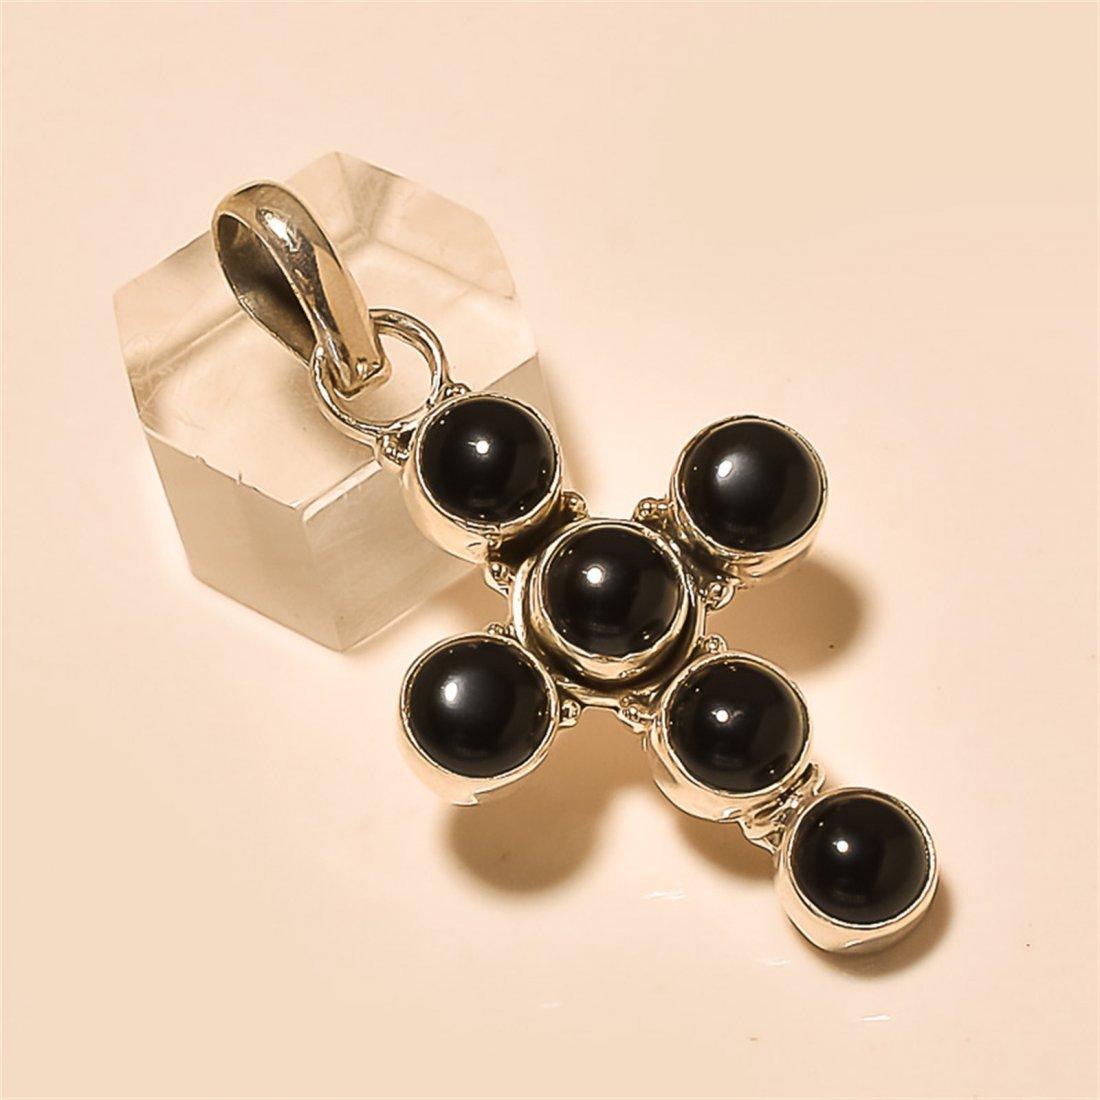 Black Spinel Pendant Solid Sterling Silver